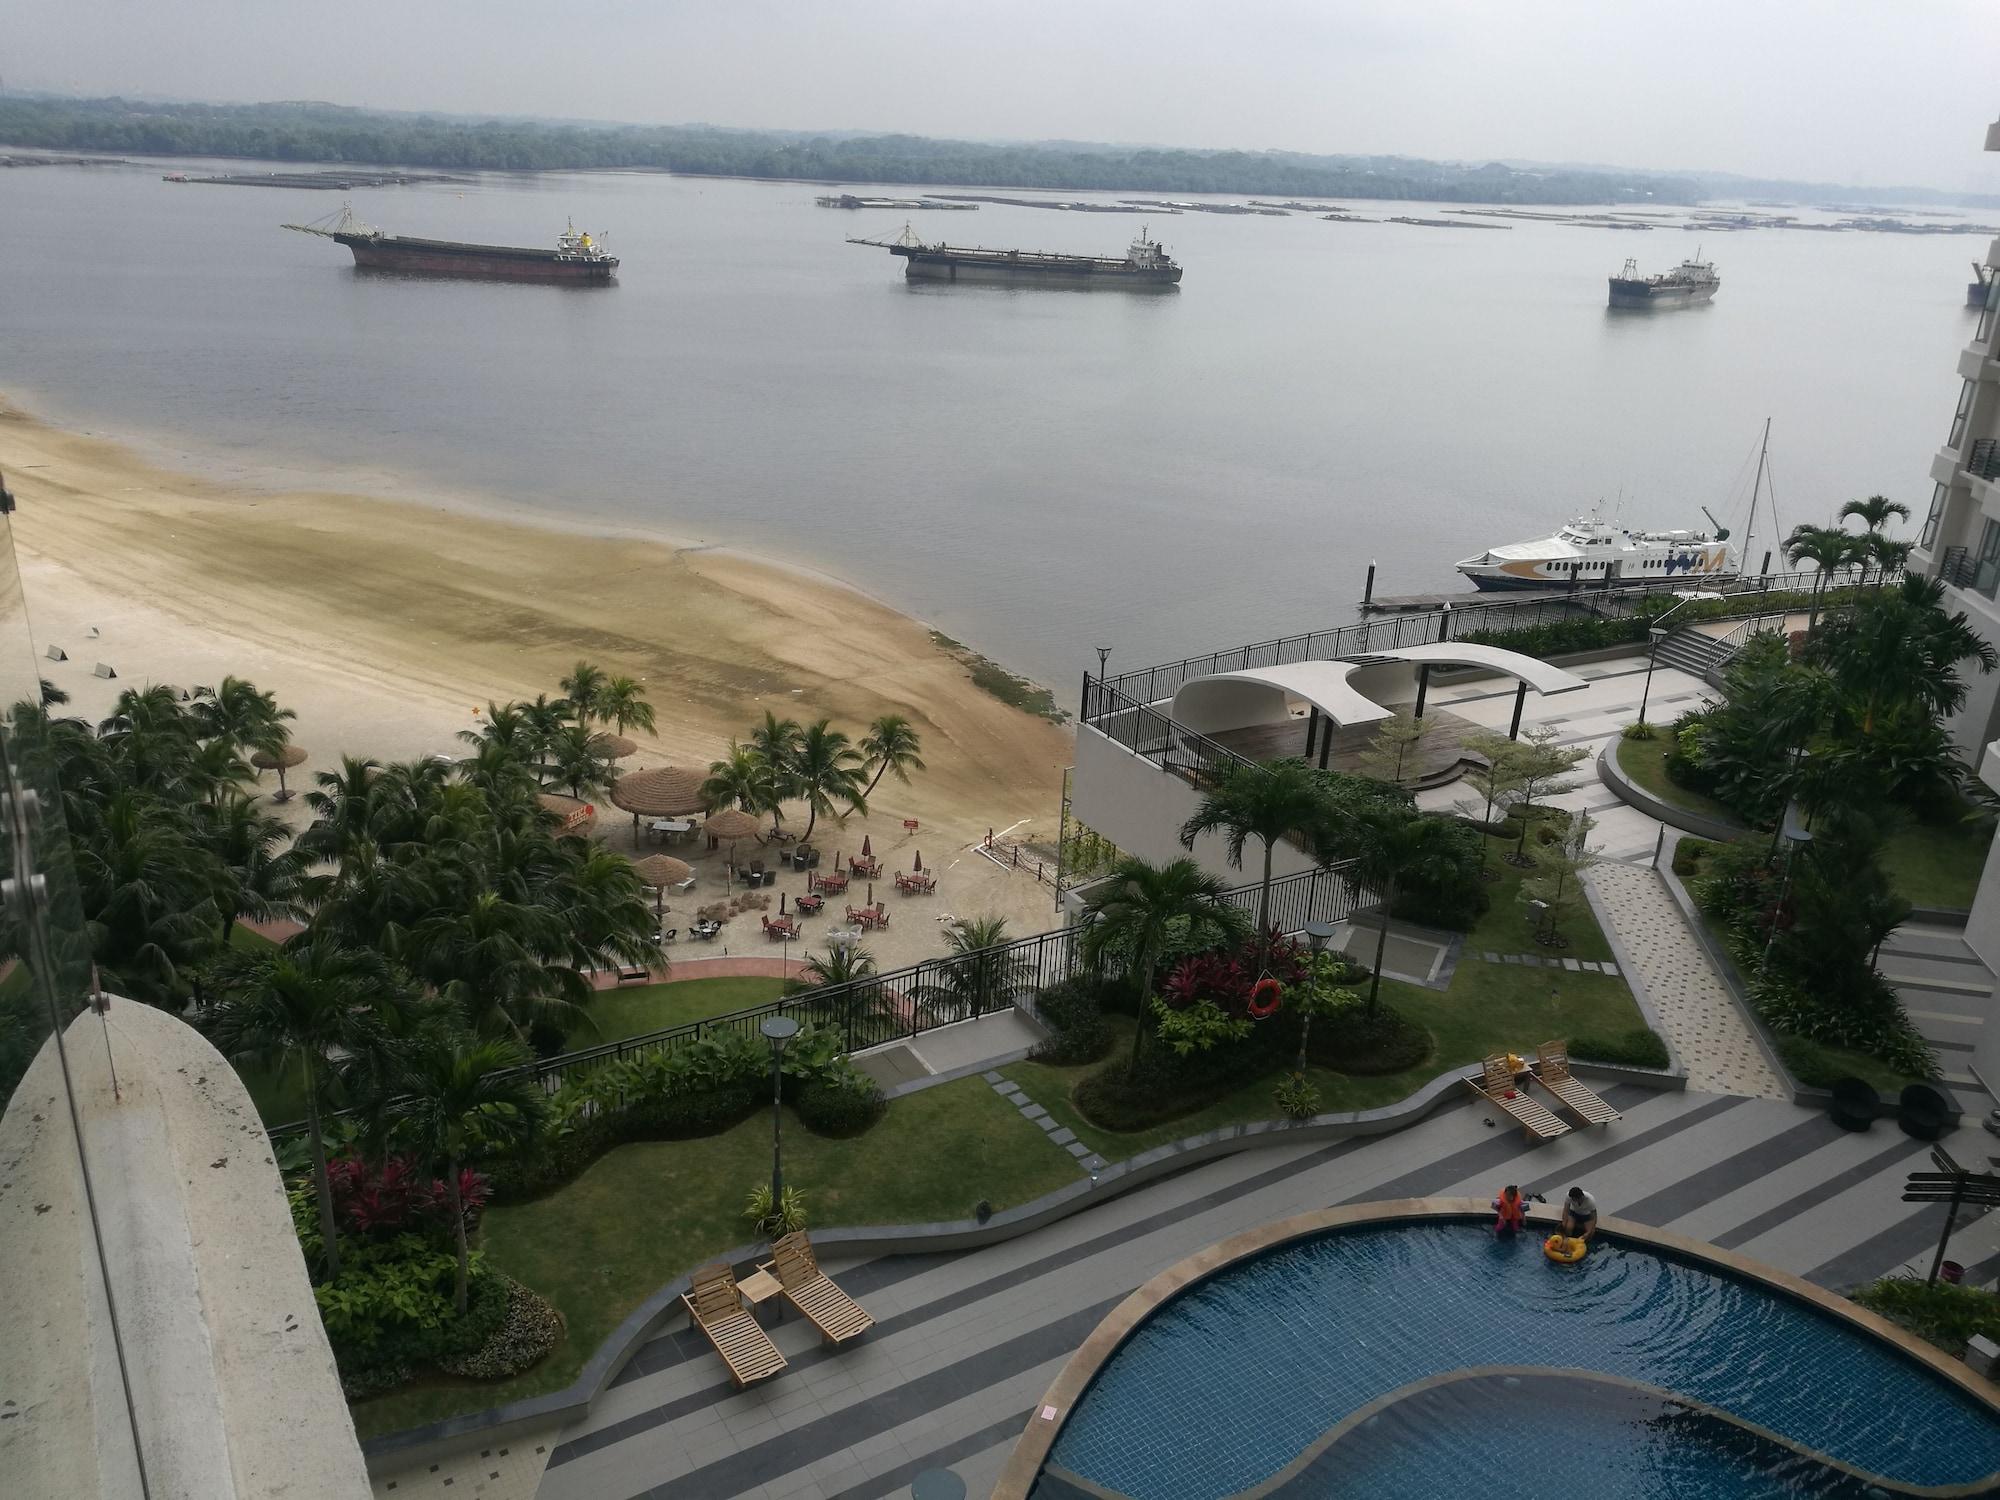 Grain of sand, Johor Bahru